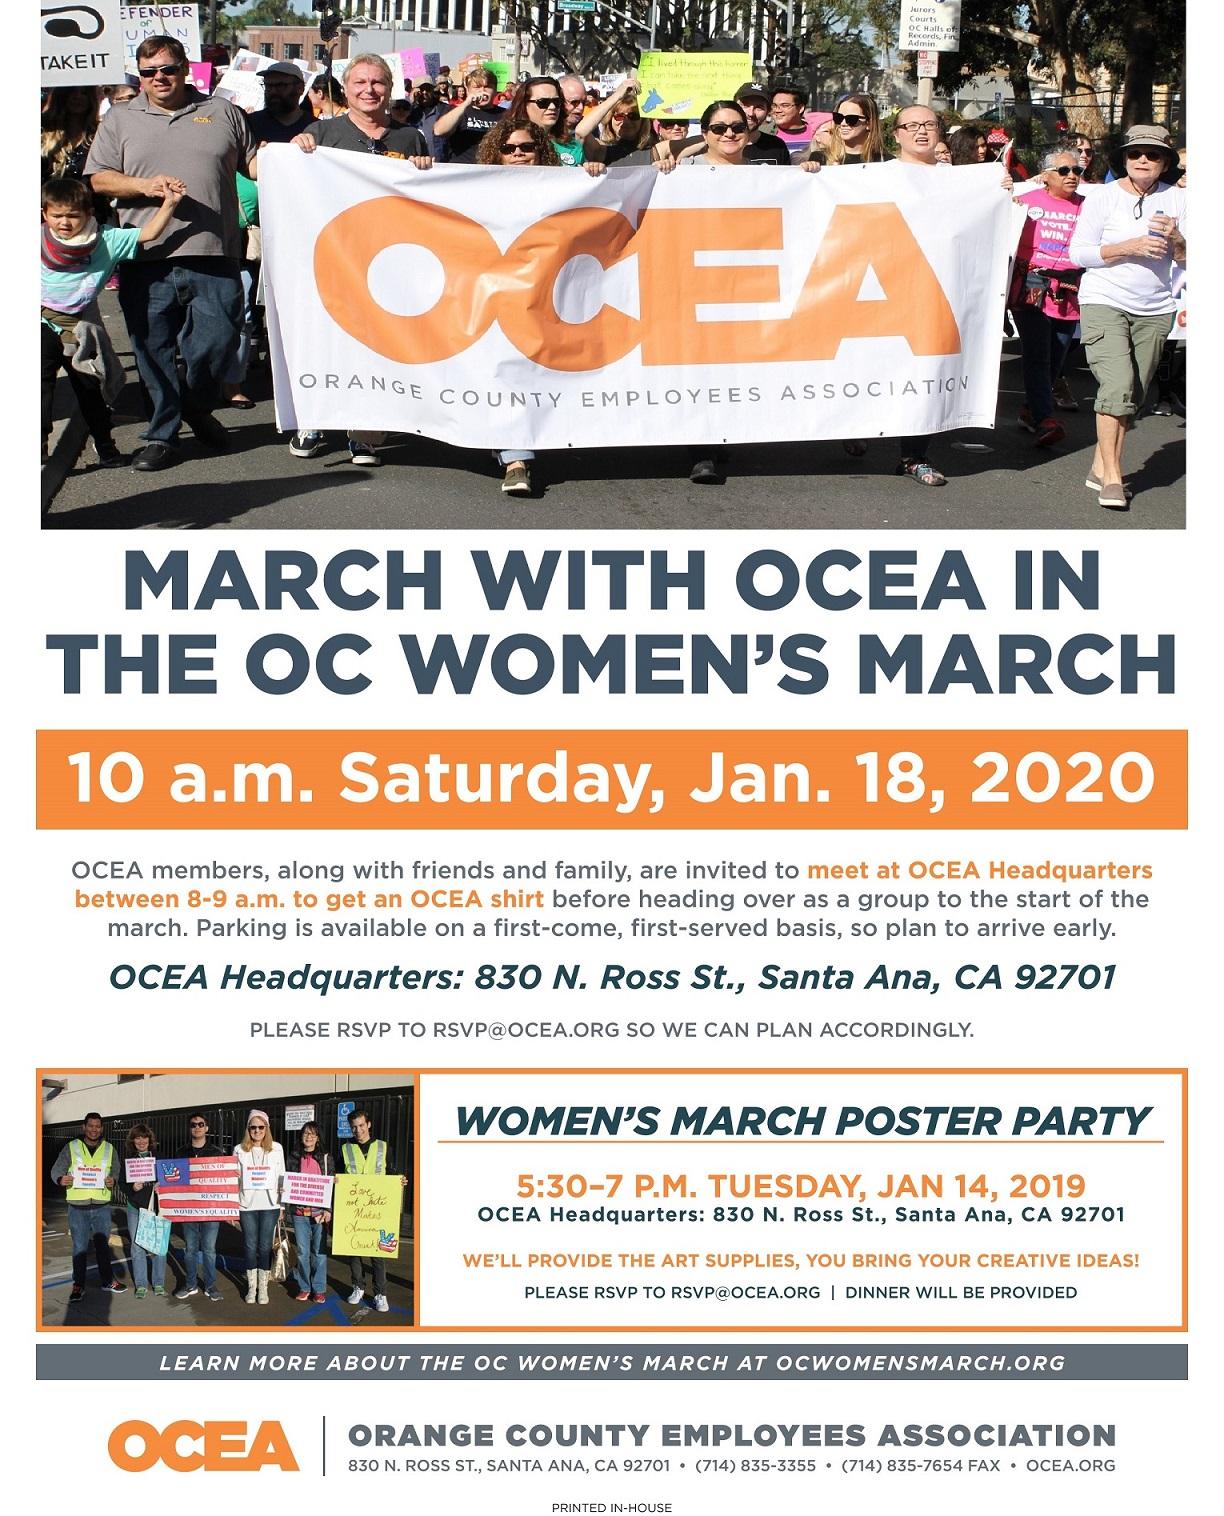 OCEA_WomensMarch_2020b.jpg